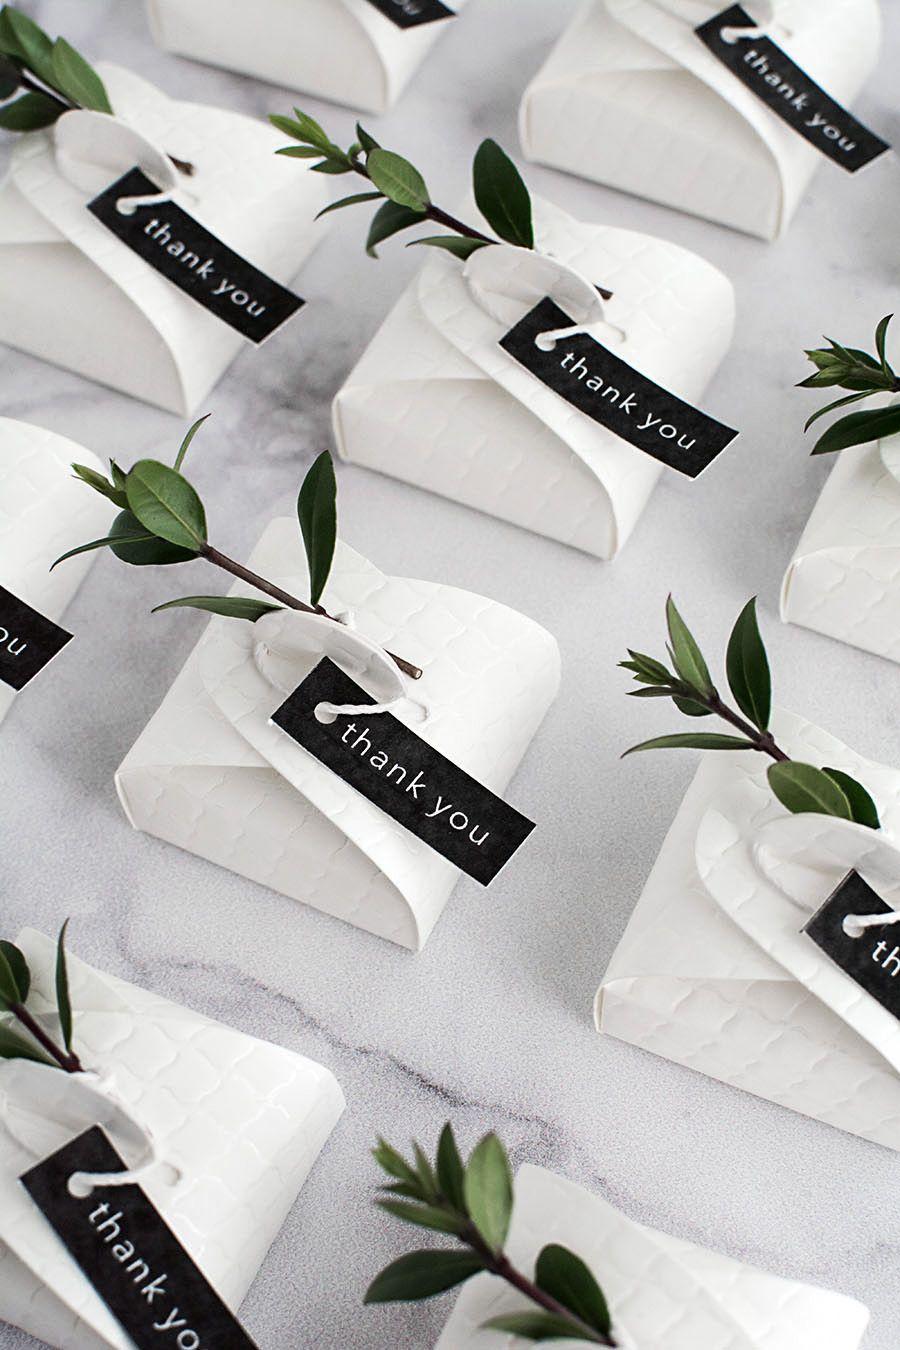 3 Simple and Modern DIY Wedding Favors   Packaging ideas, Modern diy ...